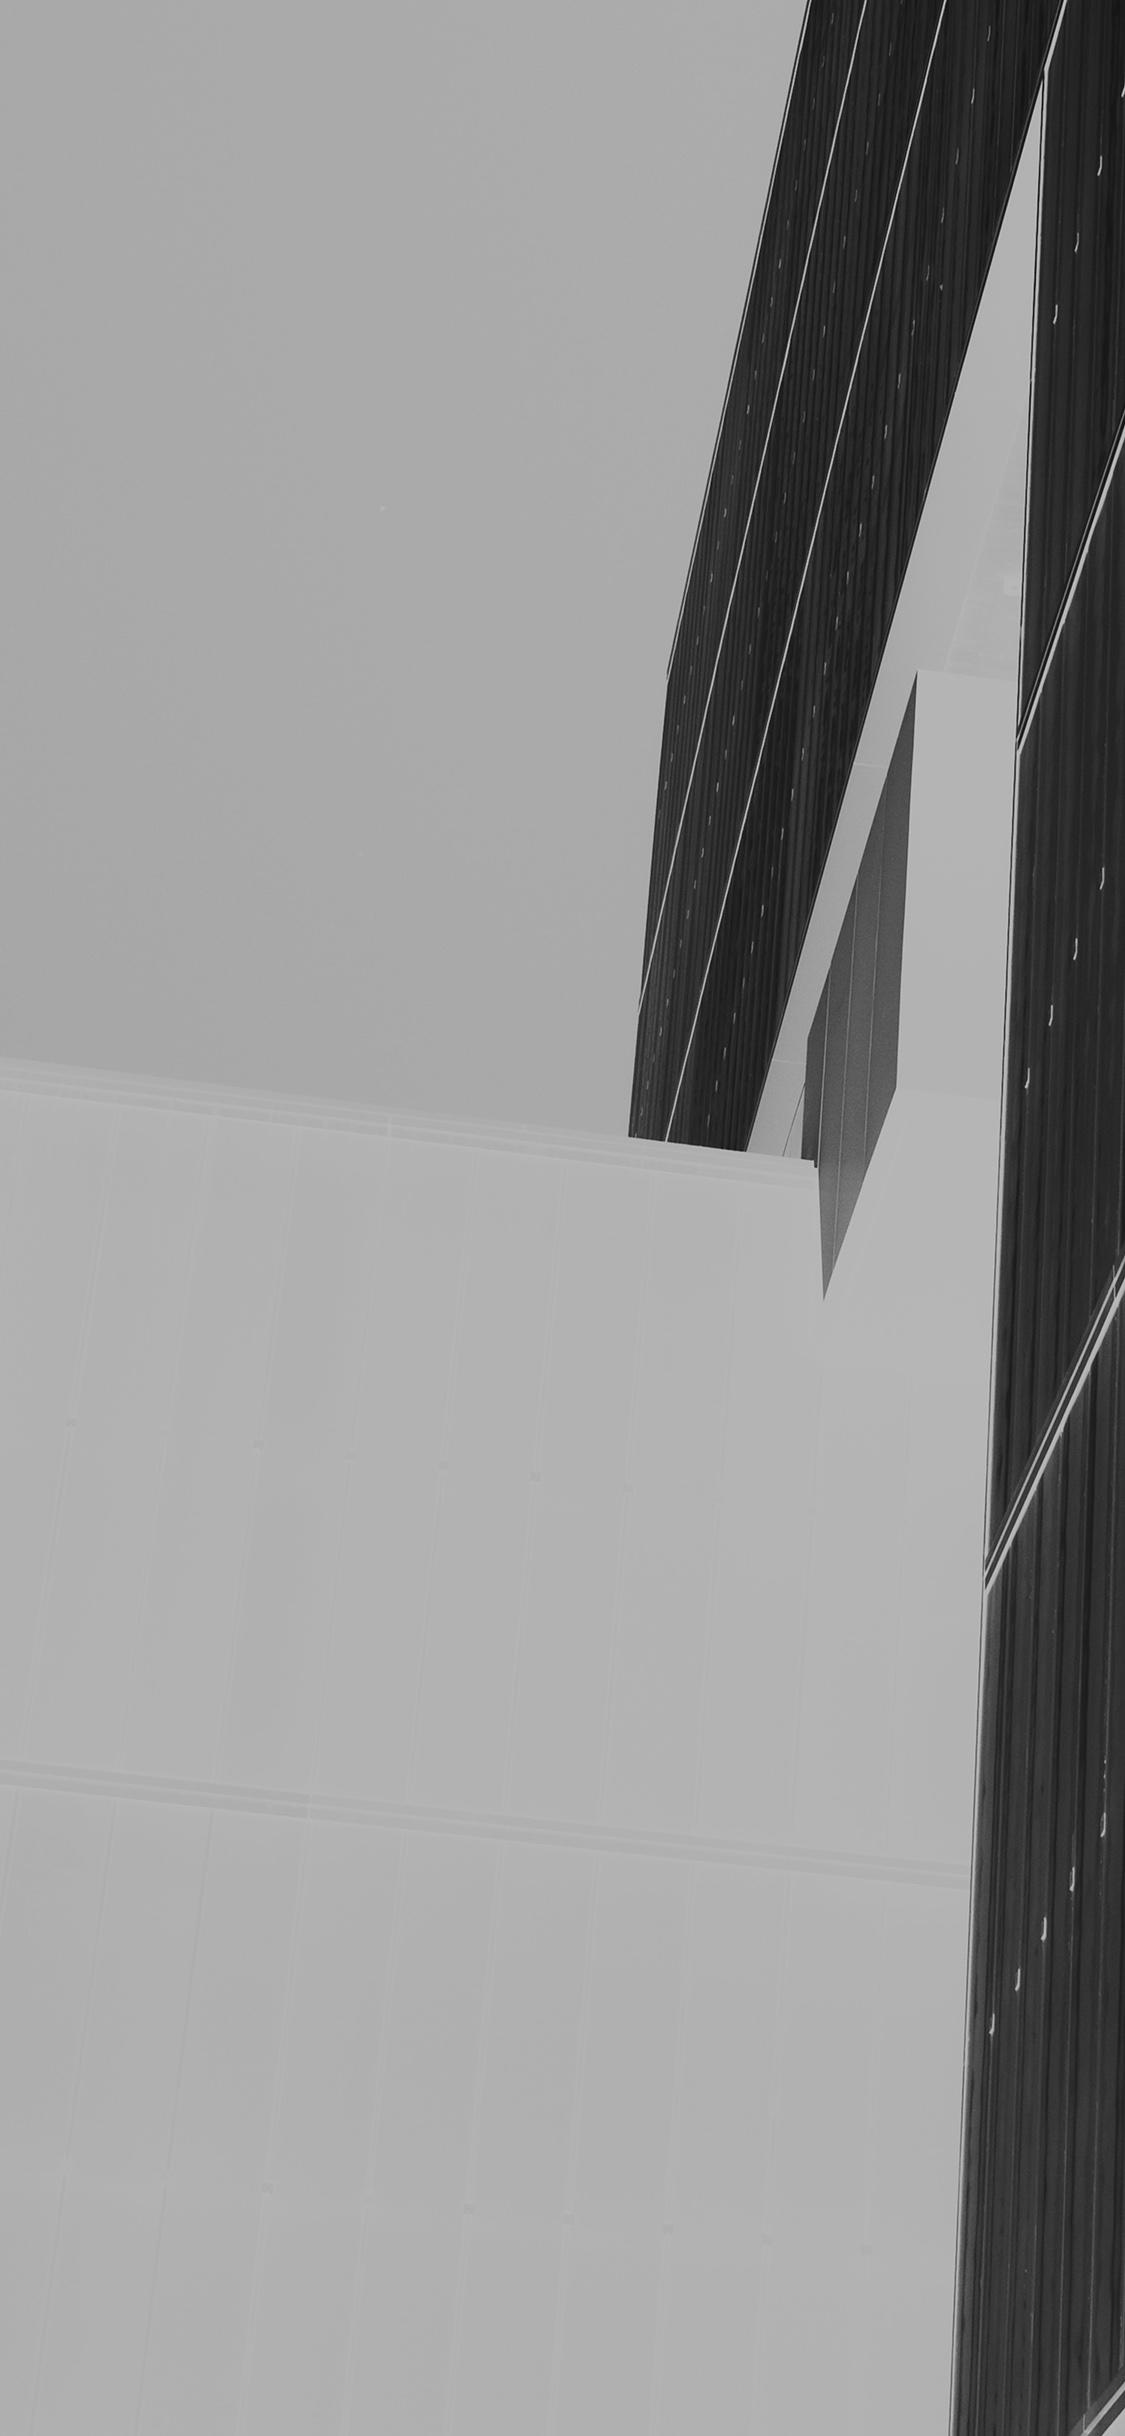 iPhoneXpapers.com-Apple-iPhone-wallpaper-mt23-city-building-art-white-bw-simple